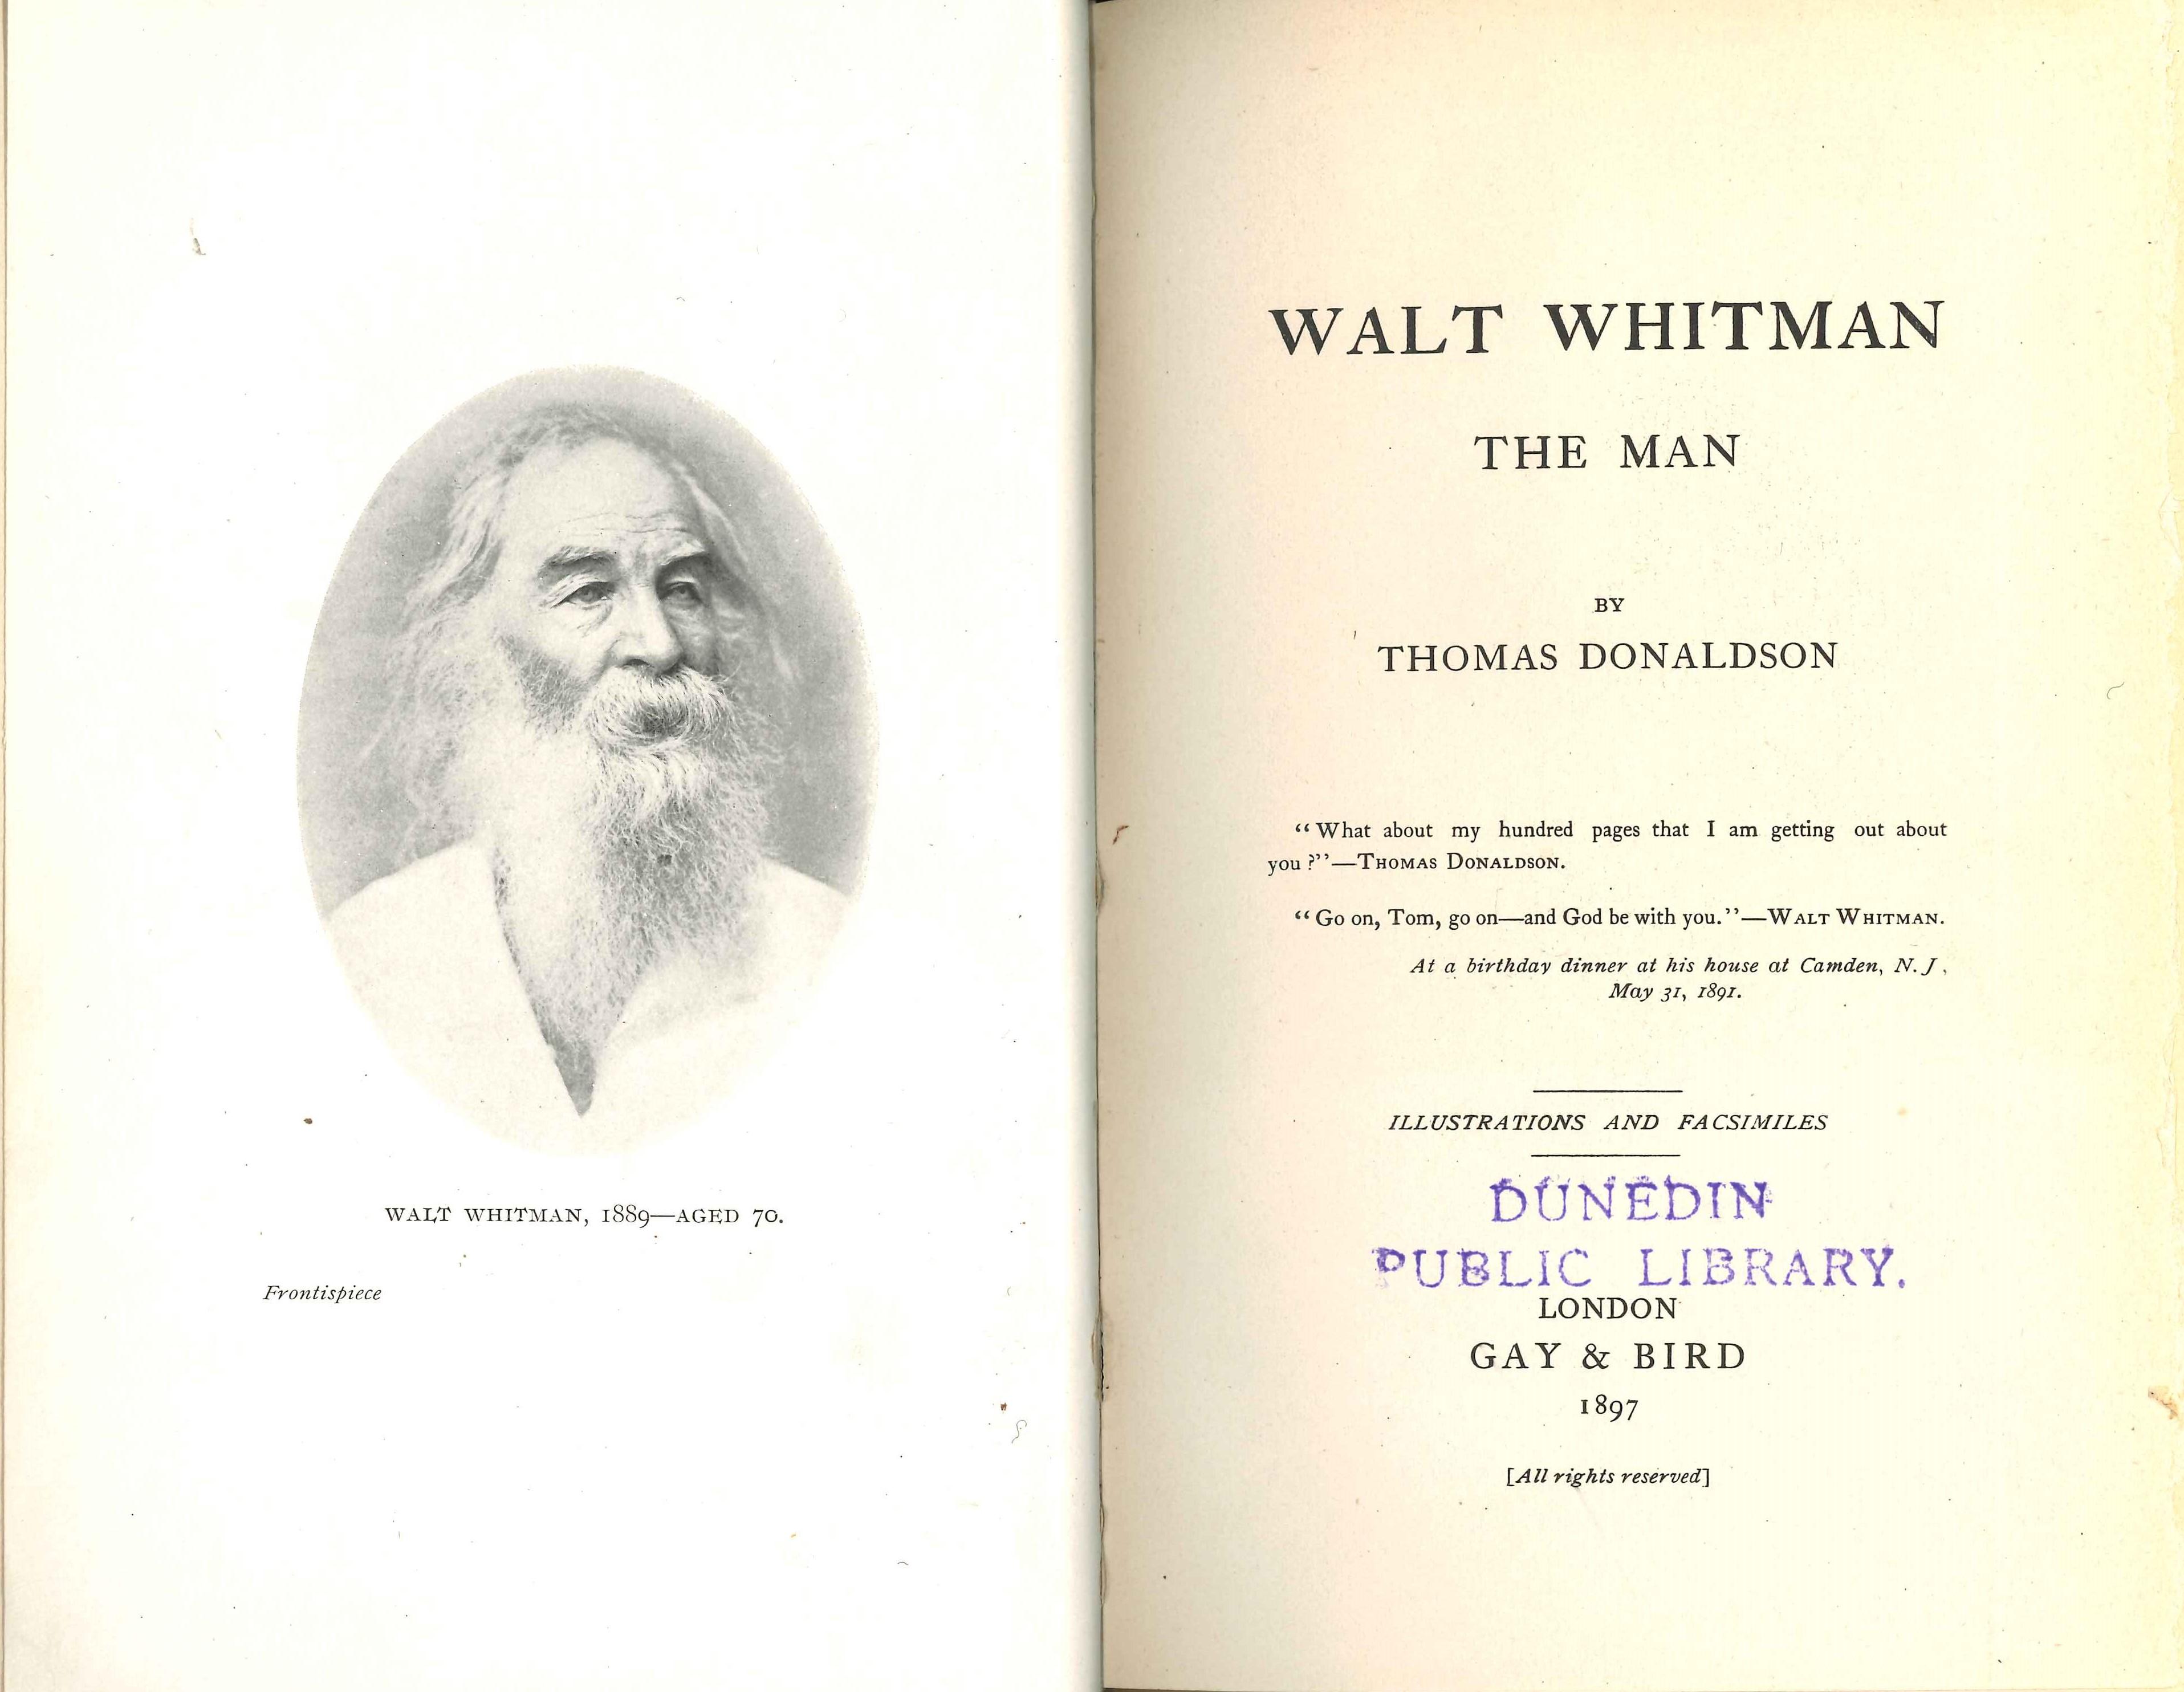 Thomas Donaldson. Walt Whitman the Man. London: Gay & Bird, 1897.